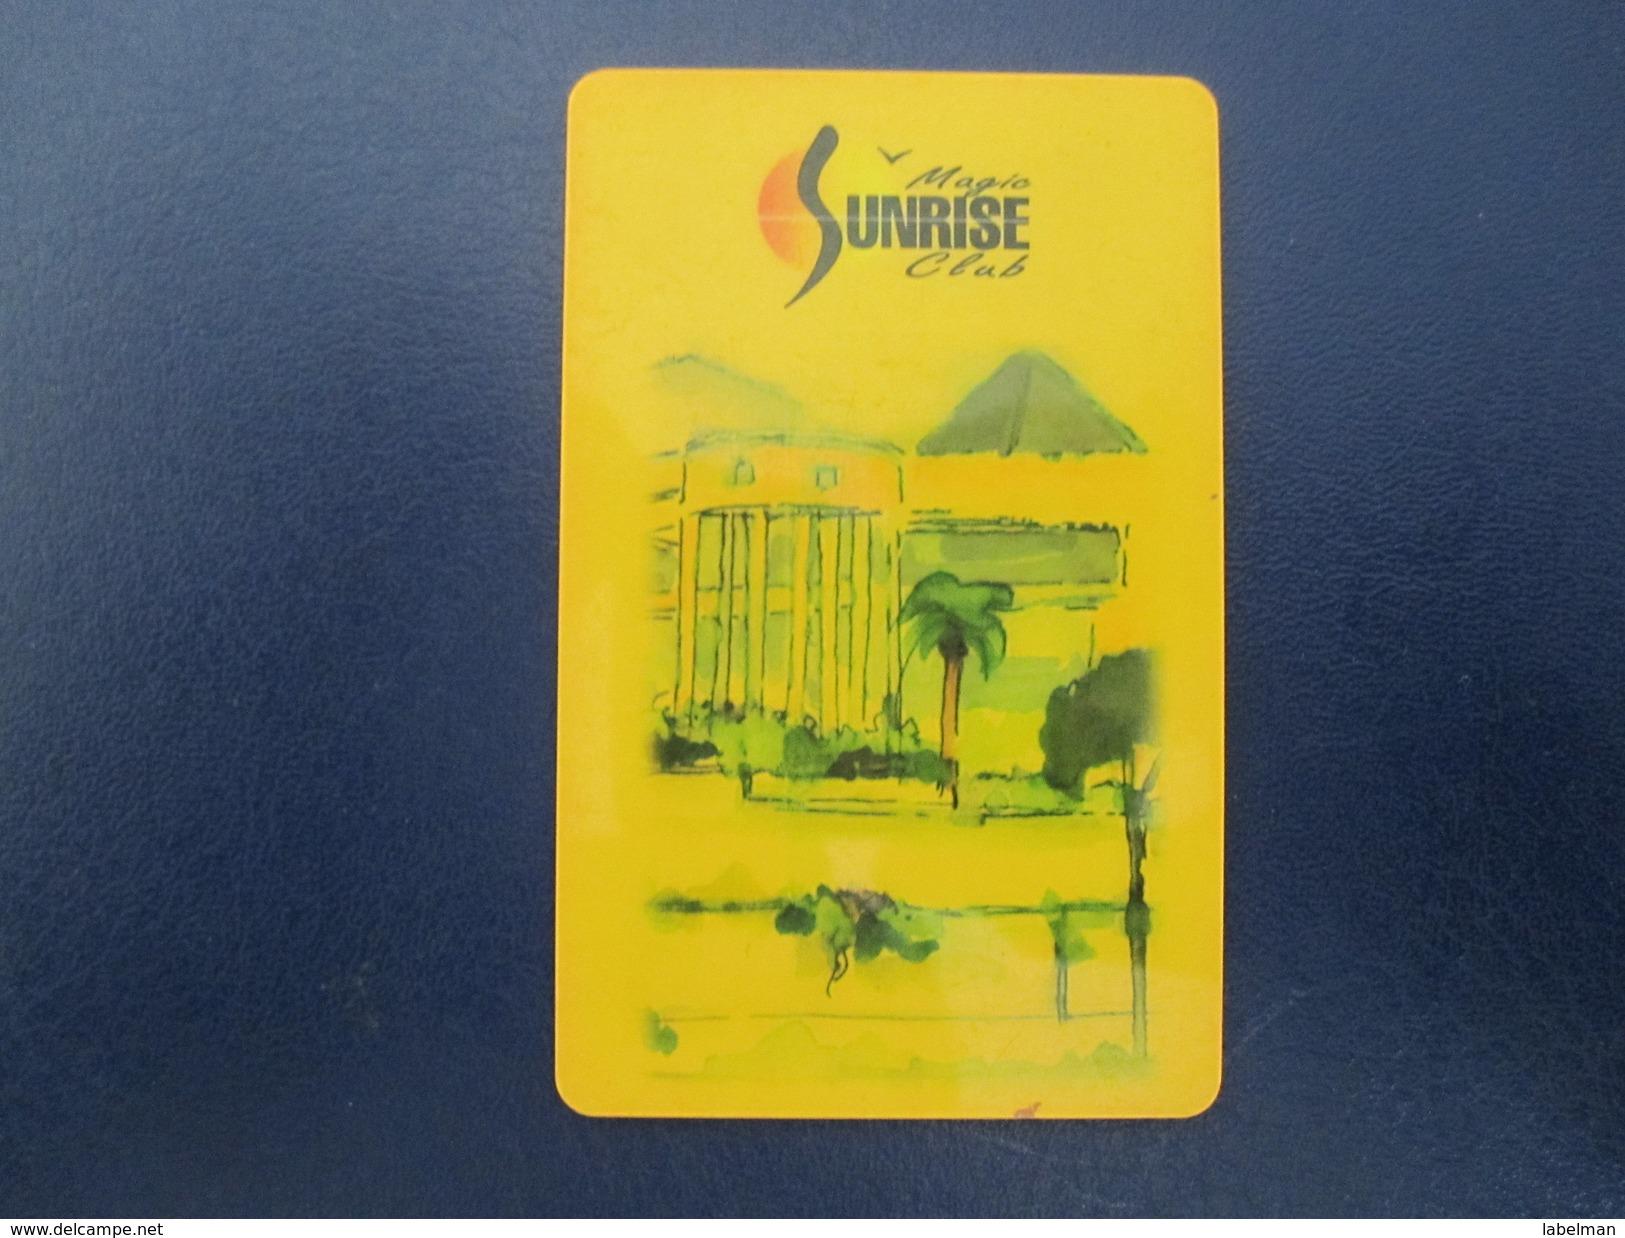 HOTEL MOTEL INN PENSION MOTOR HOUSE MAGIC SUNRISE CLUB FATTAL DEAD SEA HAIFA JERUSALEM TIBERIAS EILAT KEY CARD ISRAEL - Hotel Labels